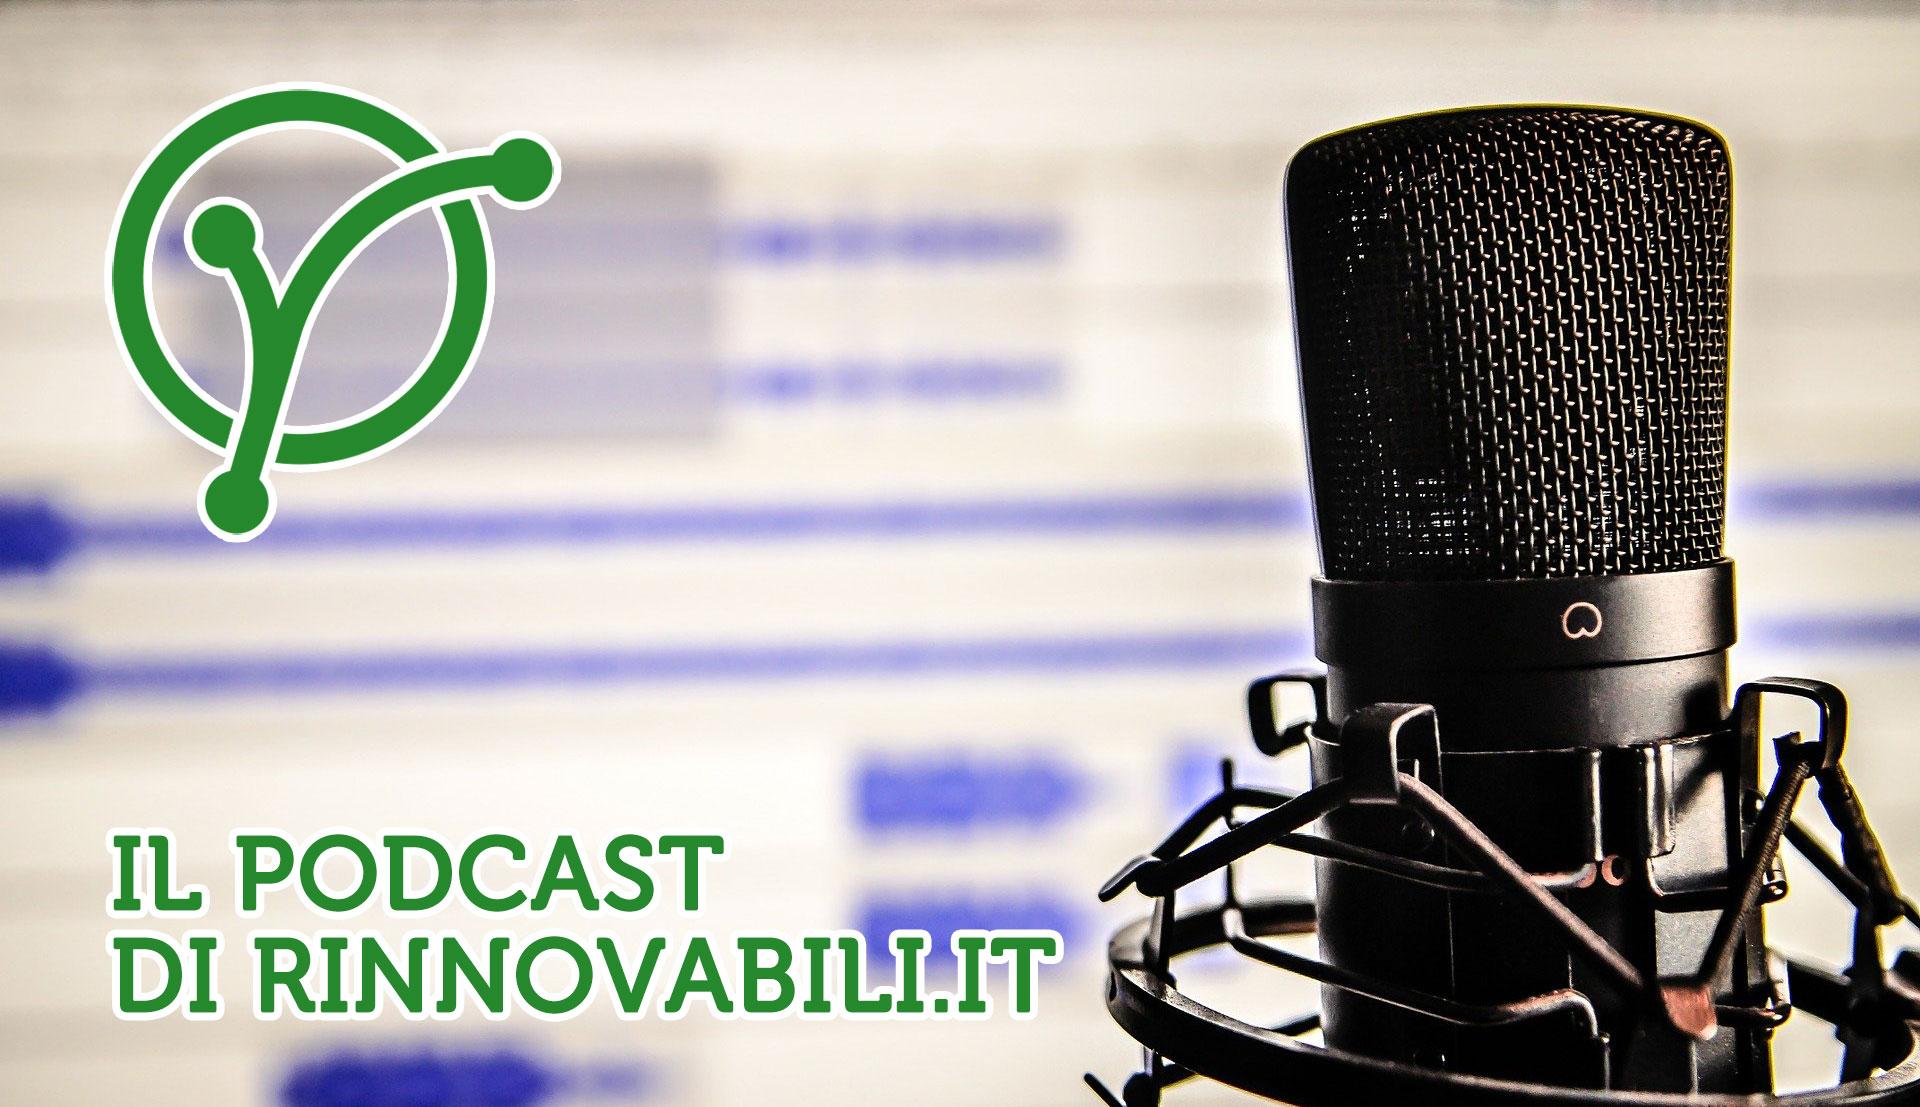 podcast rinnovabili